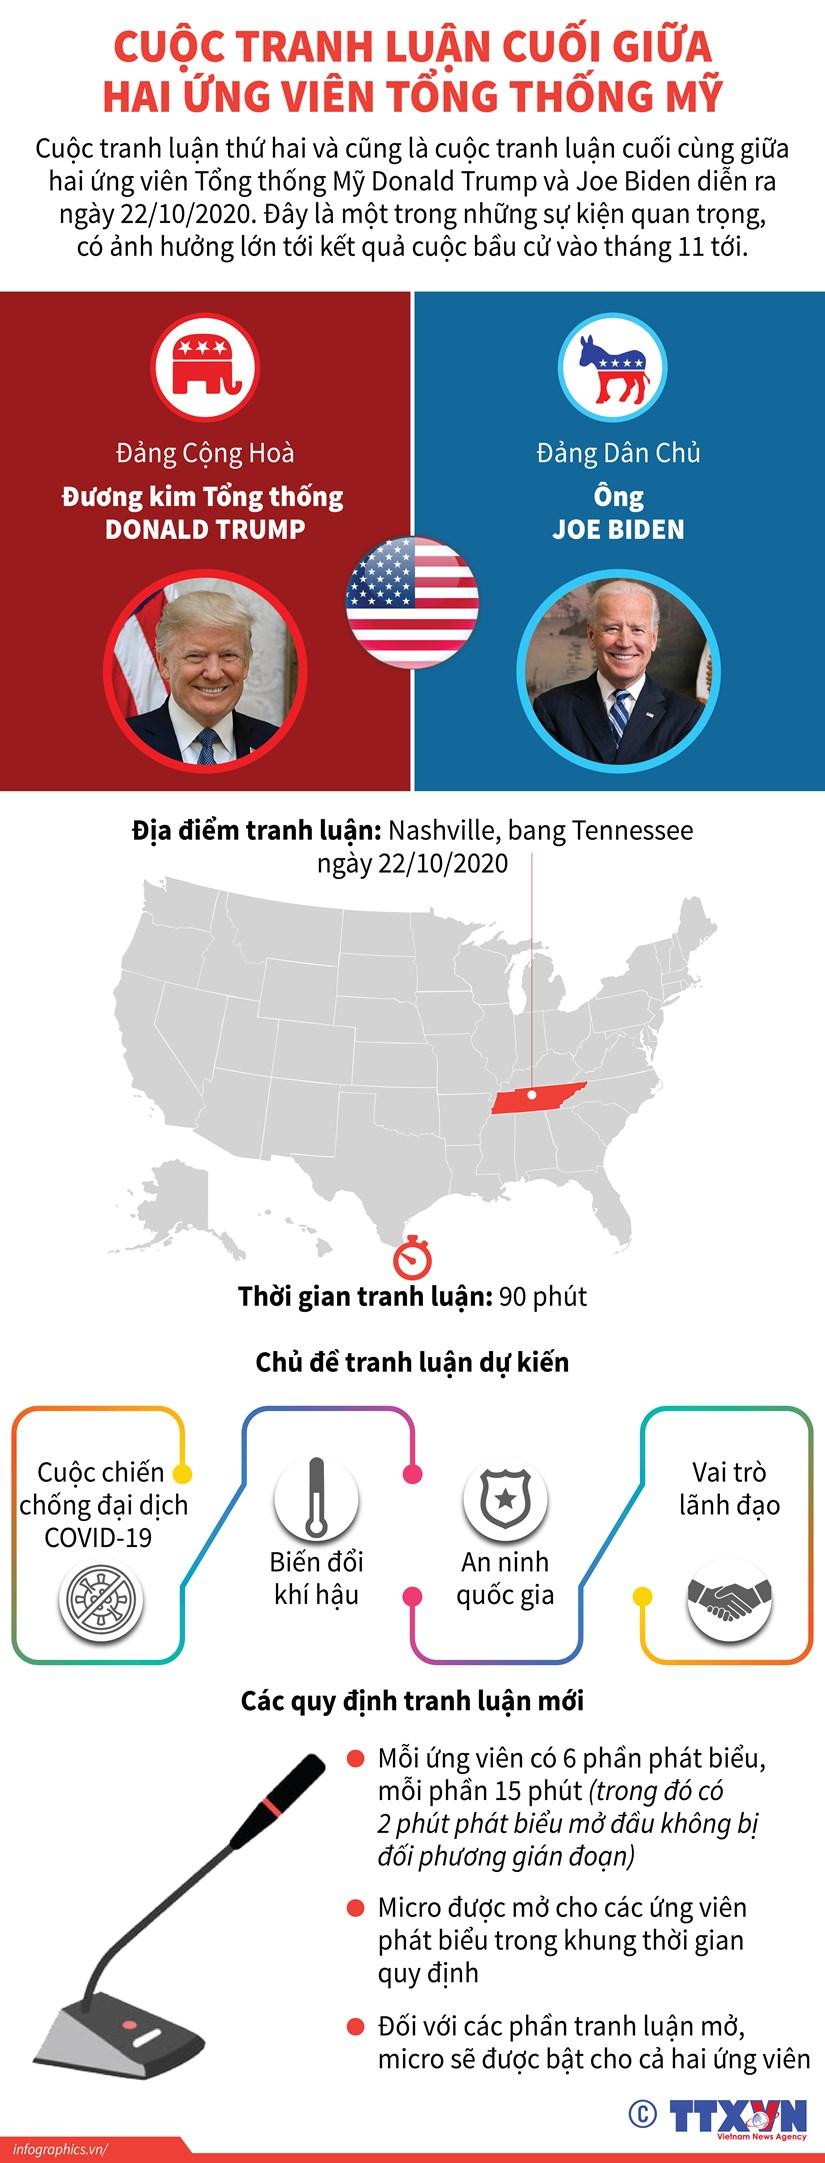 [Infographics] Cuoc tranh luan cuoi giua hai ung vien Tong thong My hinh anh 1